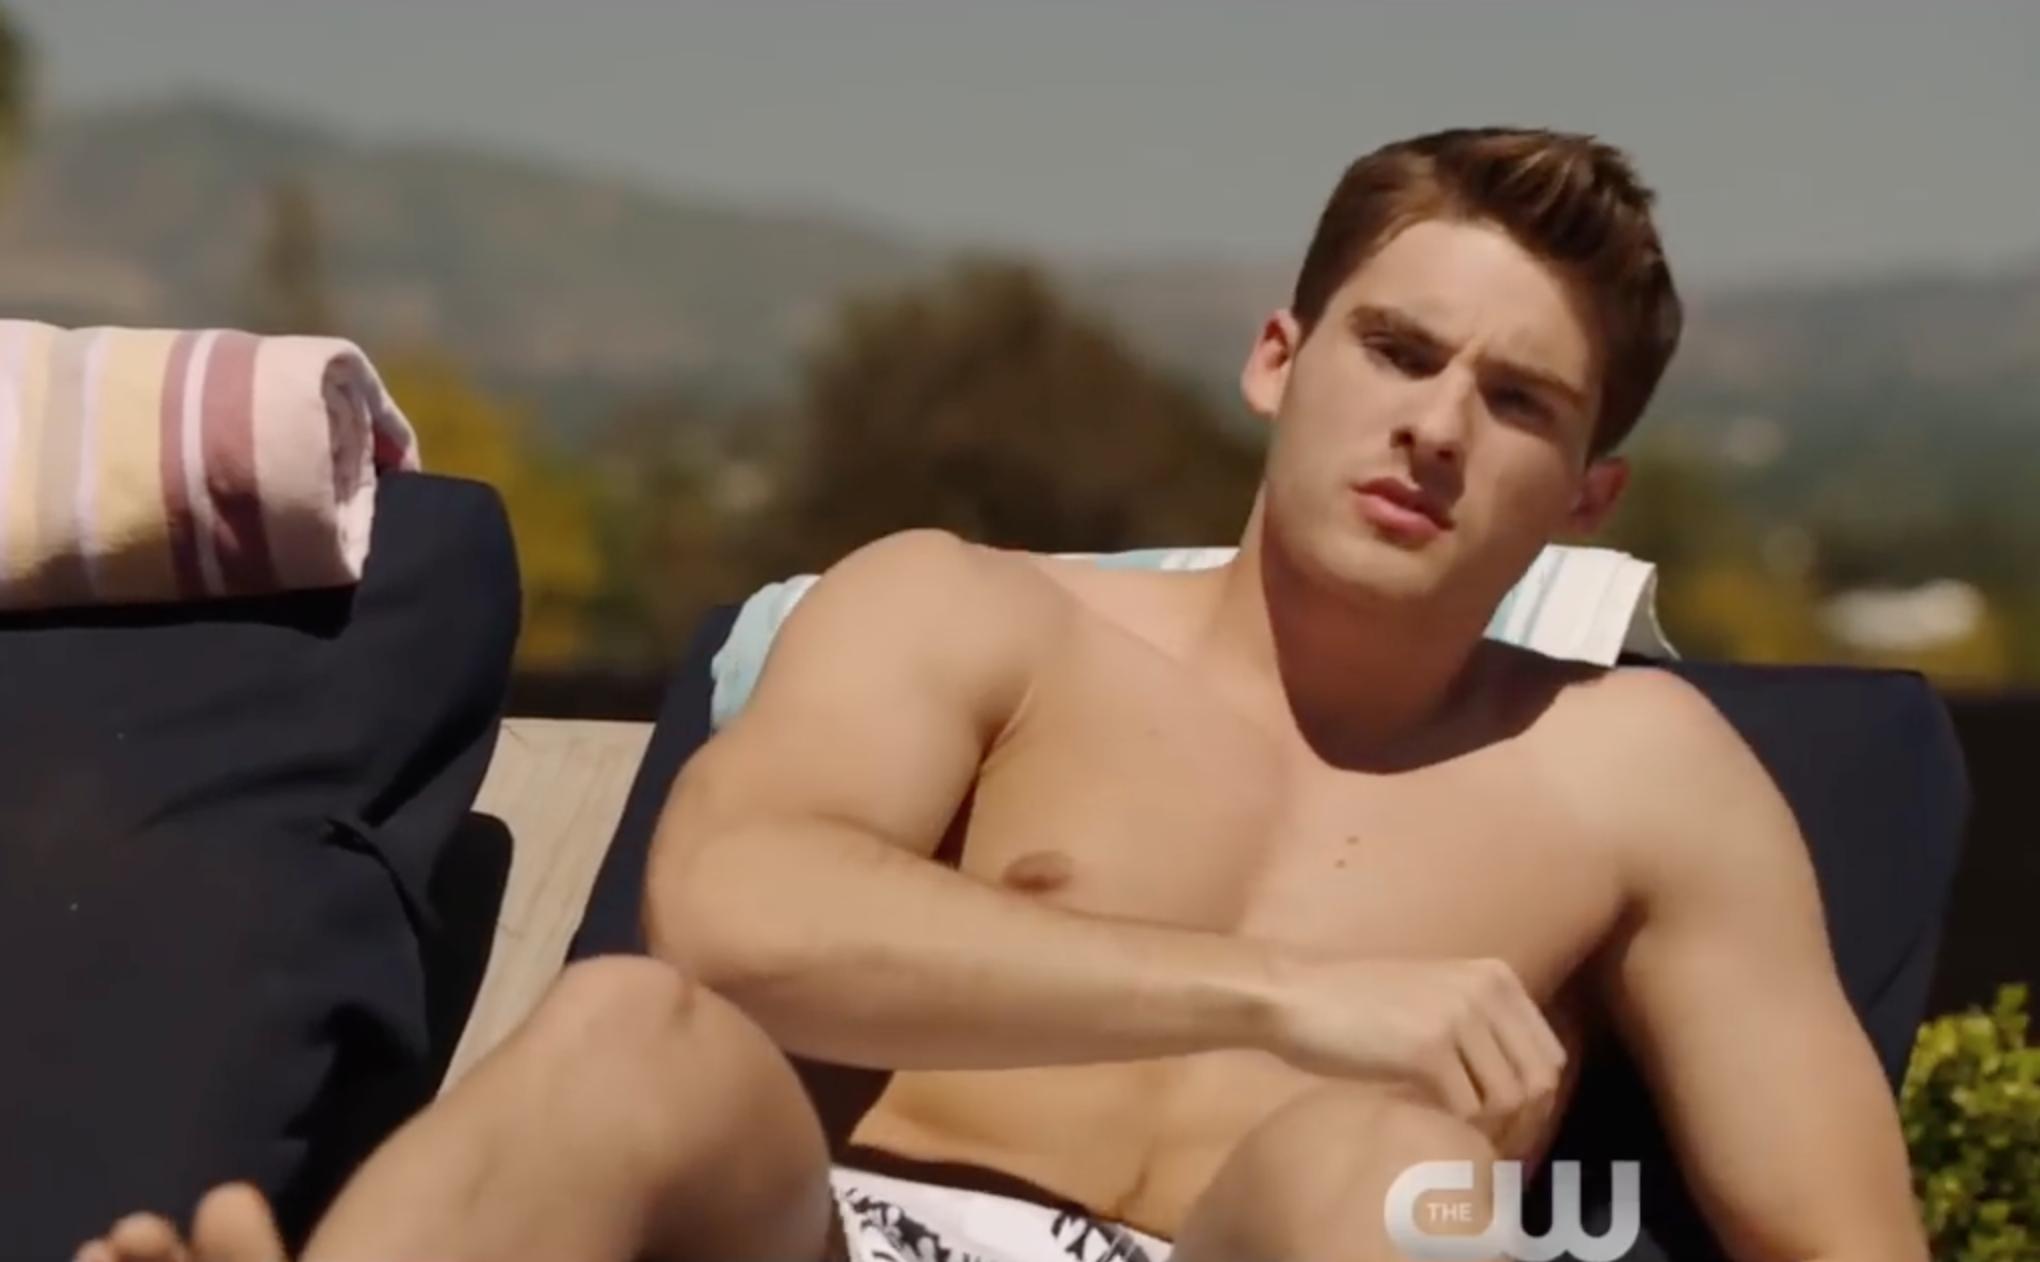 Cody christian nudes